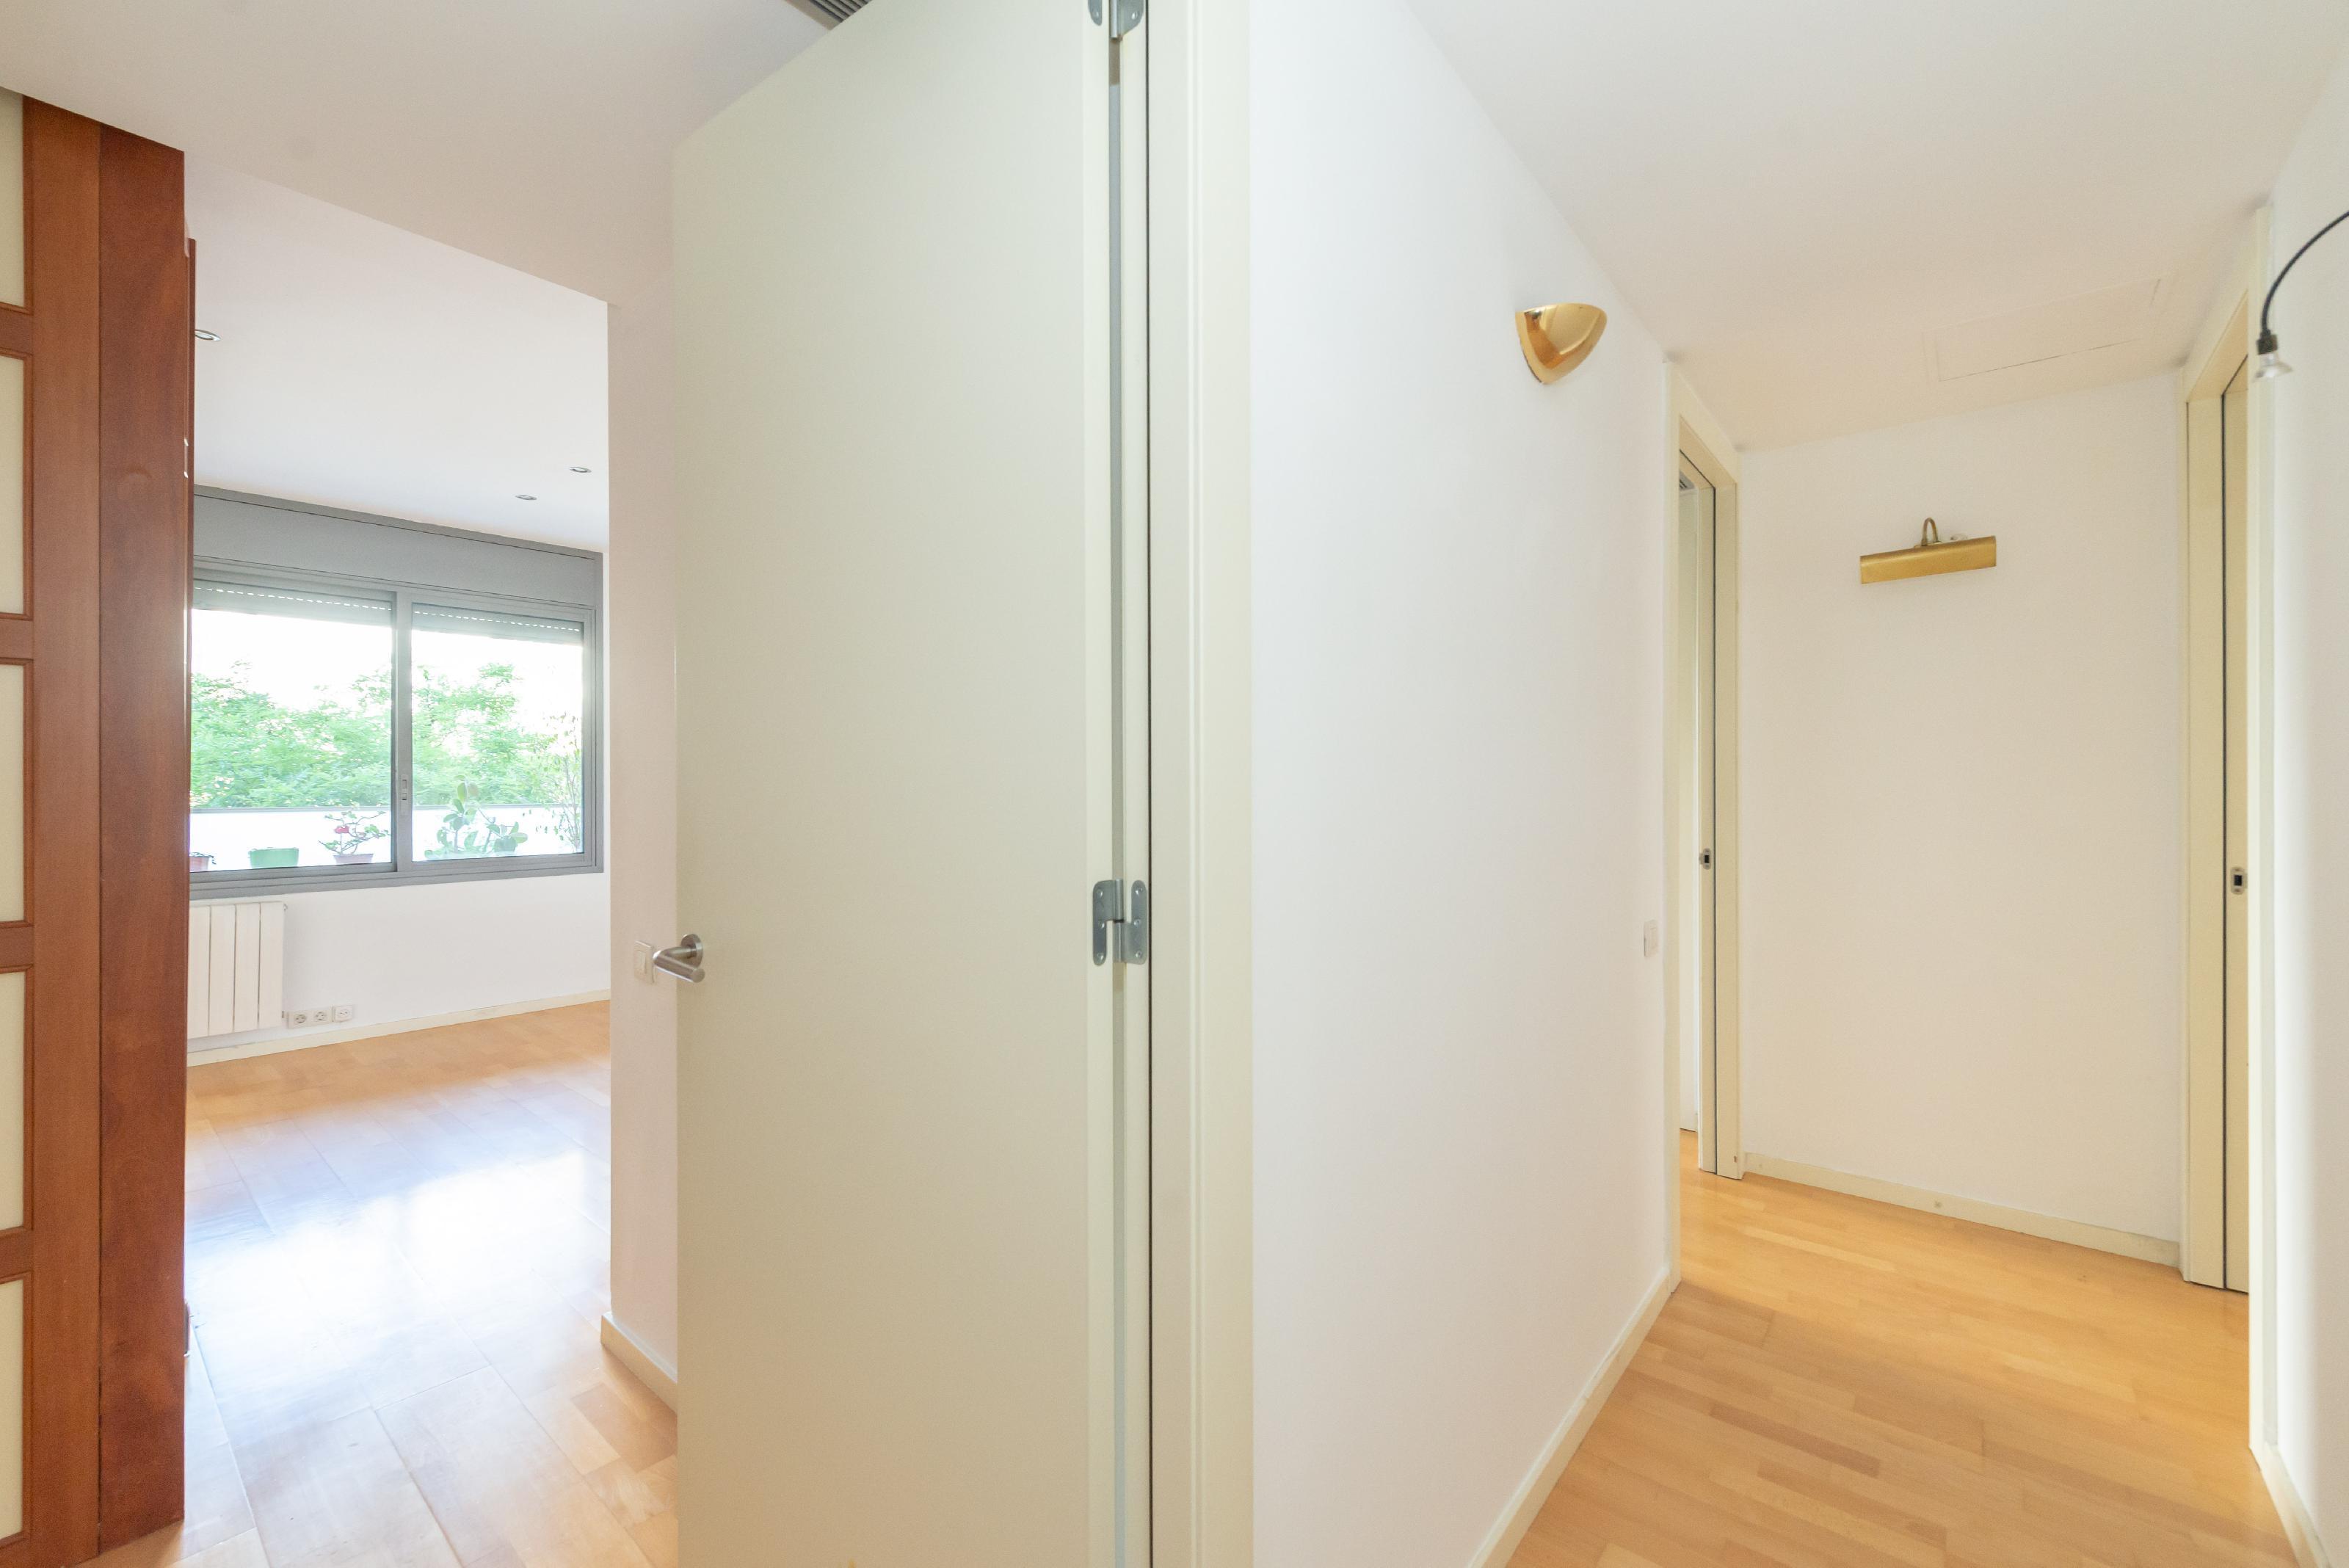 251446 Flat for sale in Sarrià-Sant Gervasi, Tres Torres 22